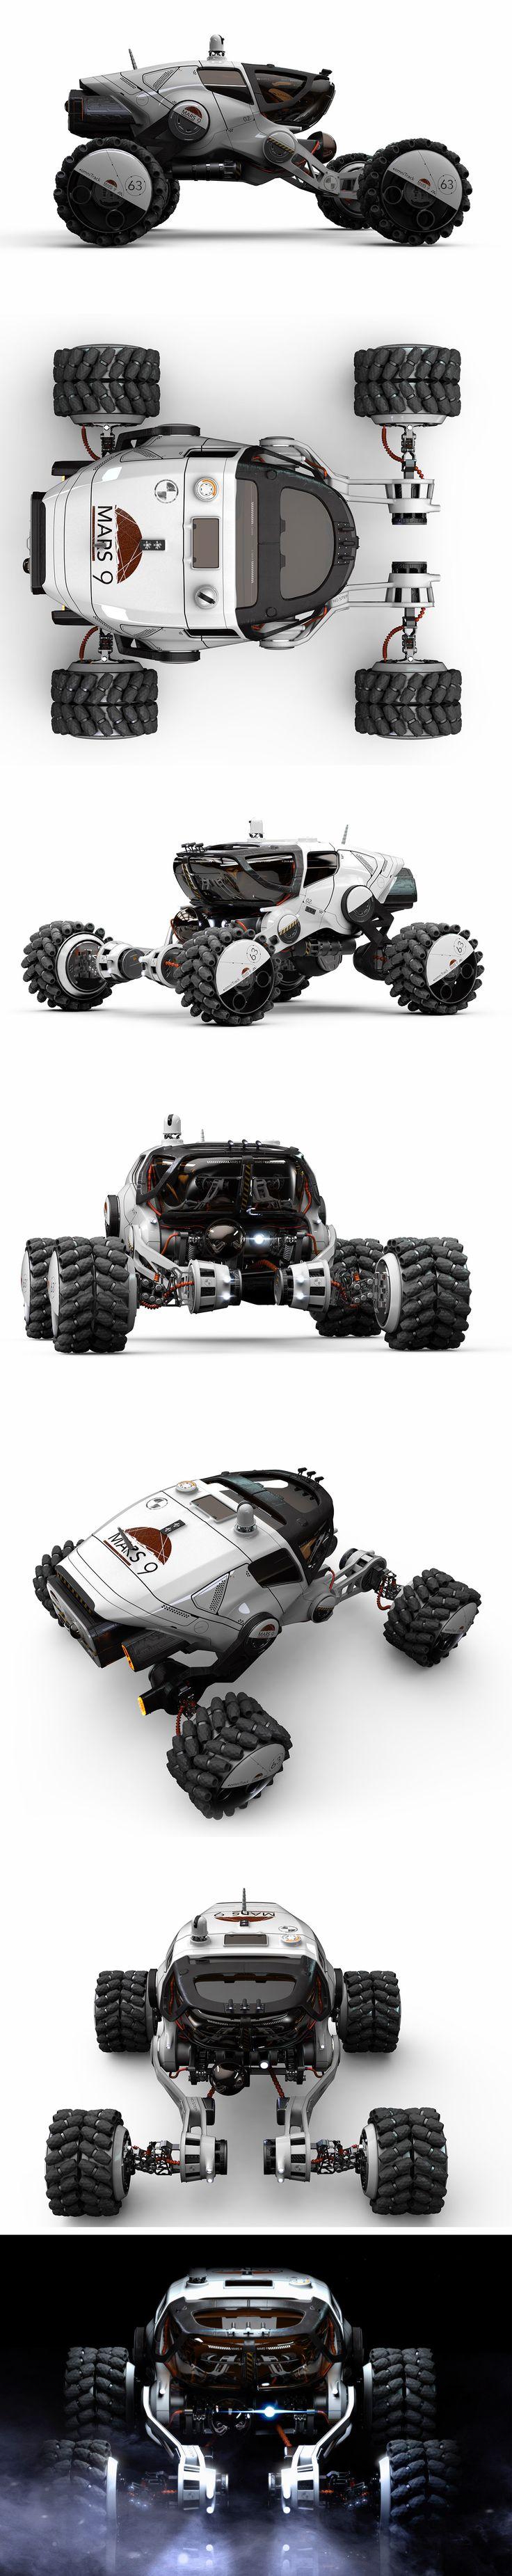 Mars 9 rover by Igor Sobolevsky